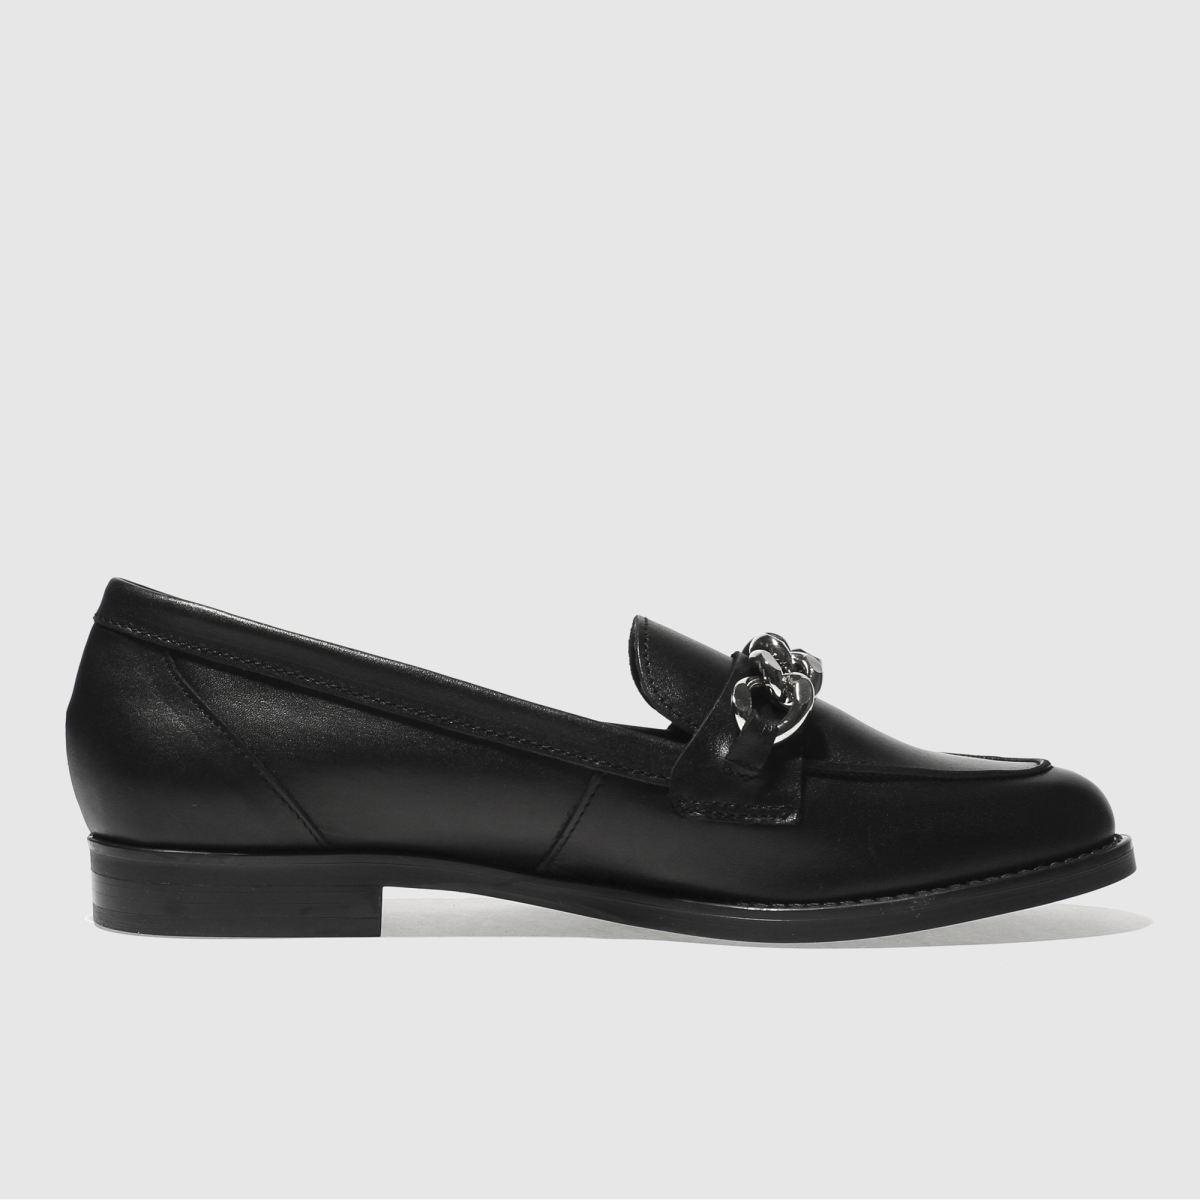 Schuh Black Radius Flat Shoes